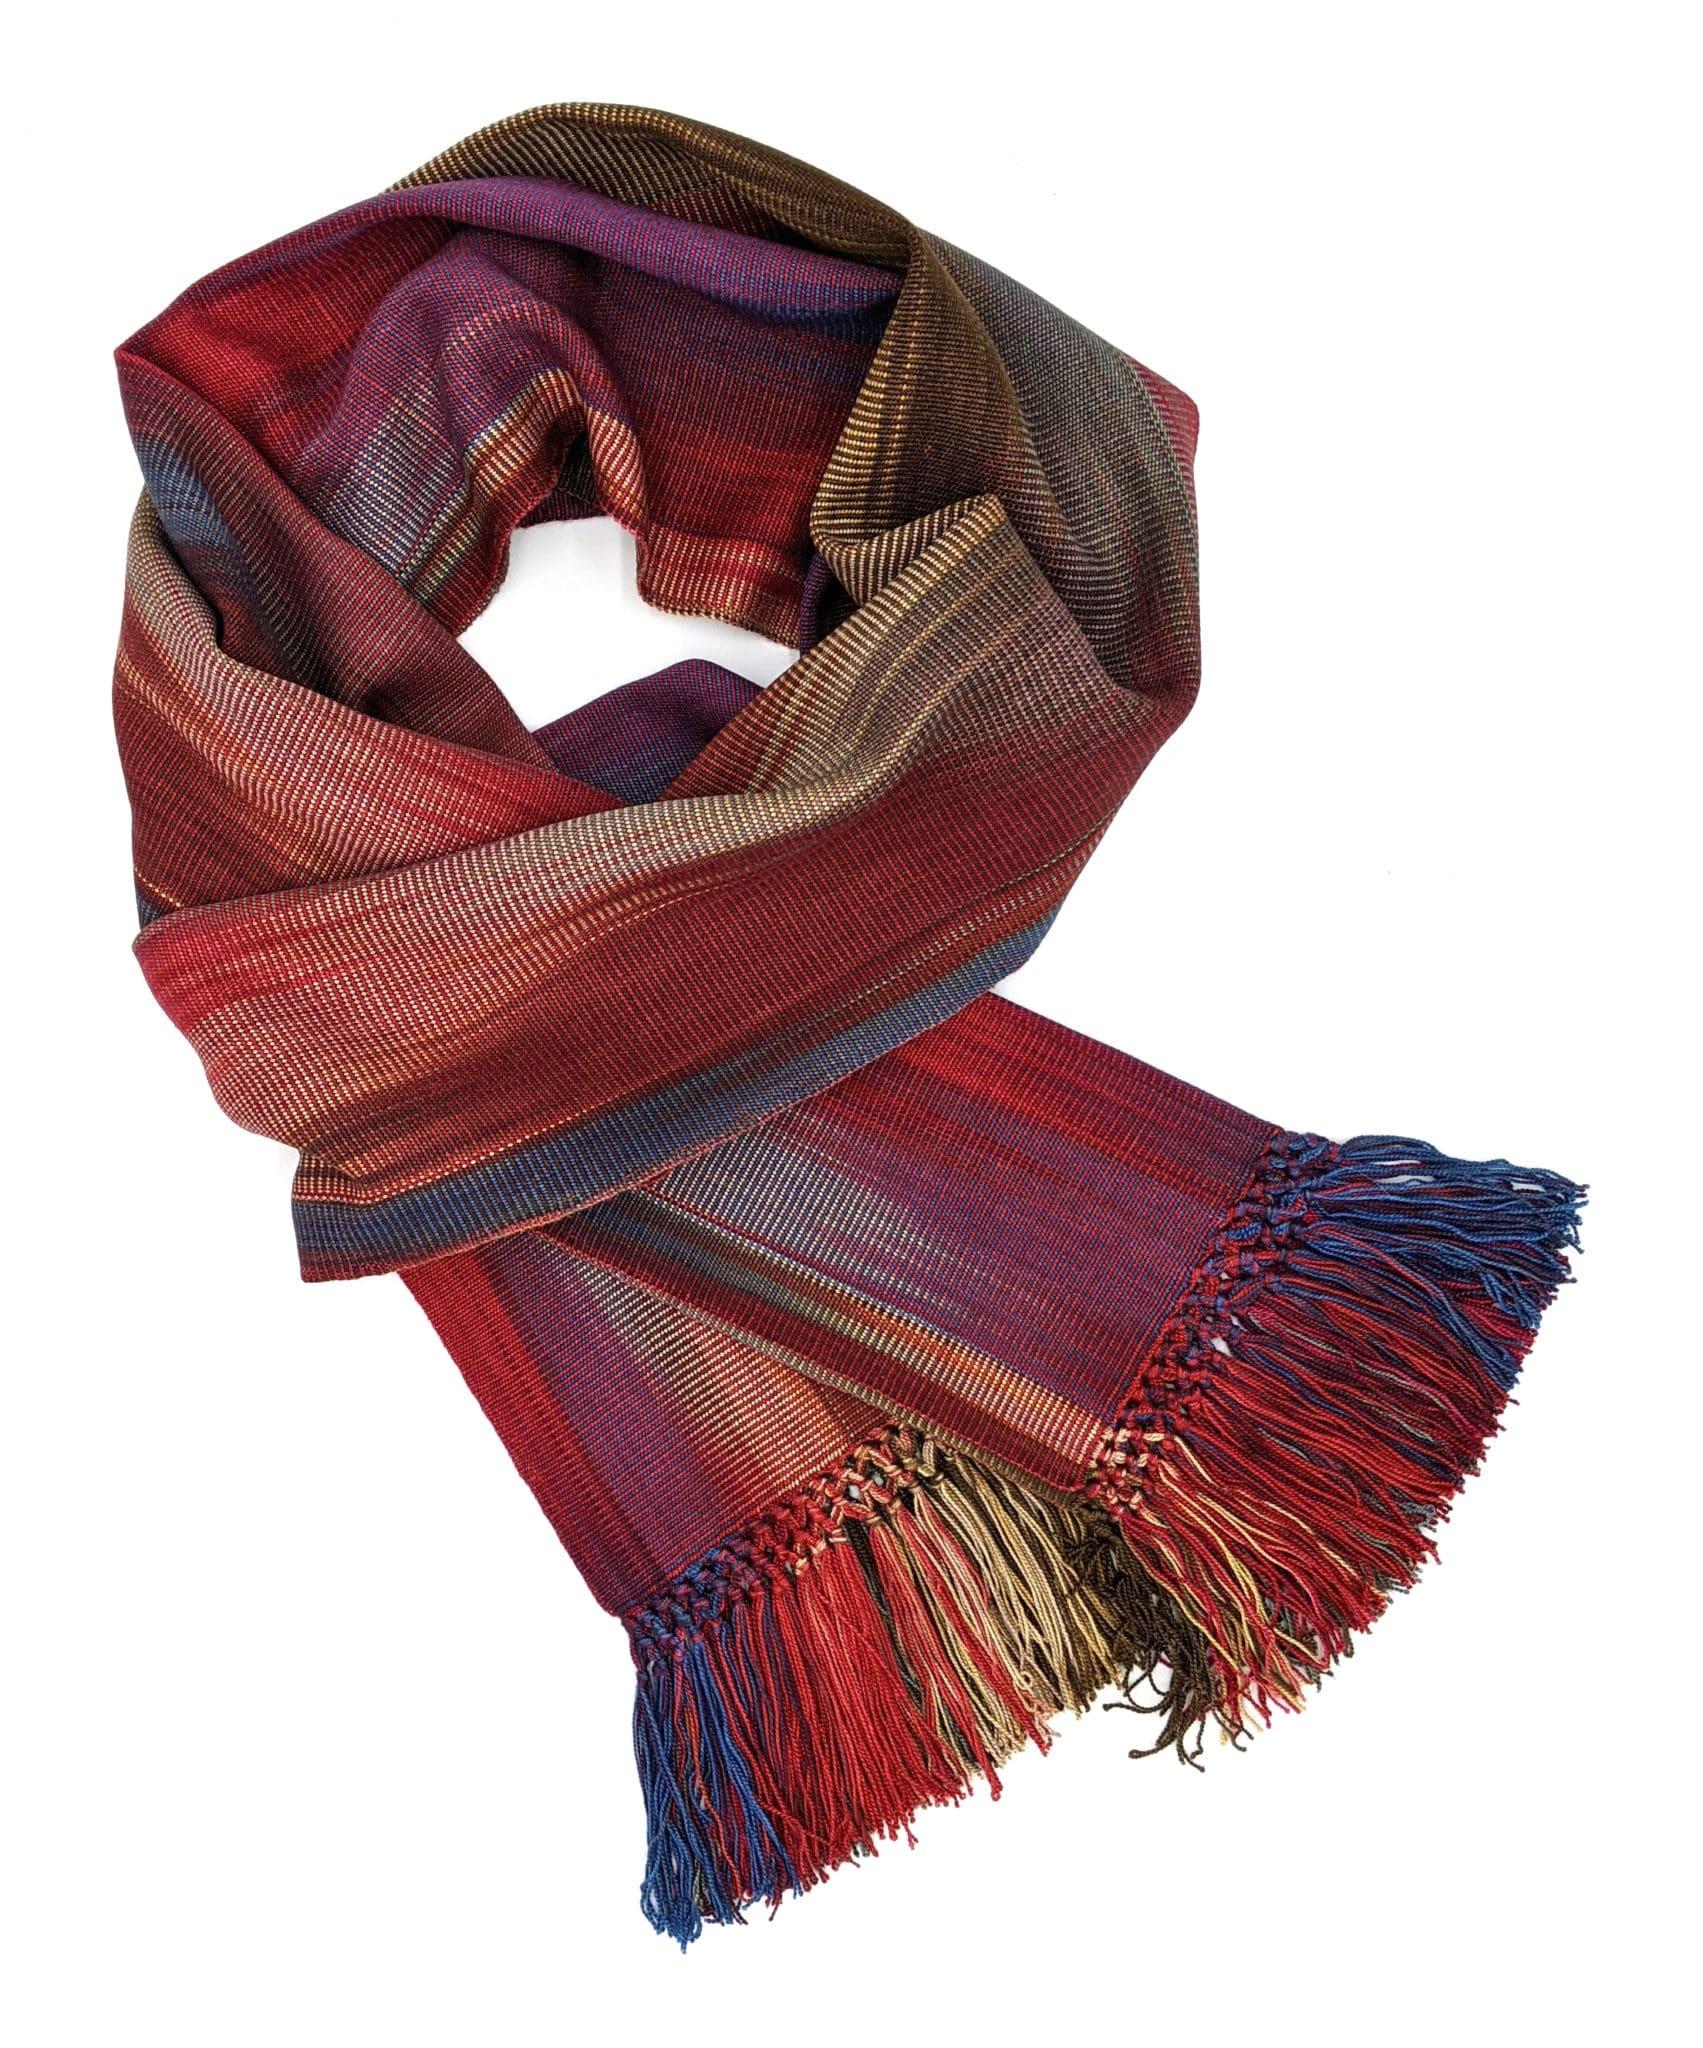 Red, Blue, Cream, Brown - Lightweight Bamboo Handwoven Scarf 8 x 68